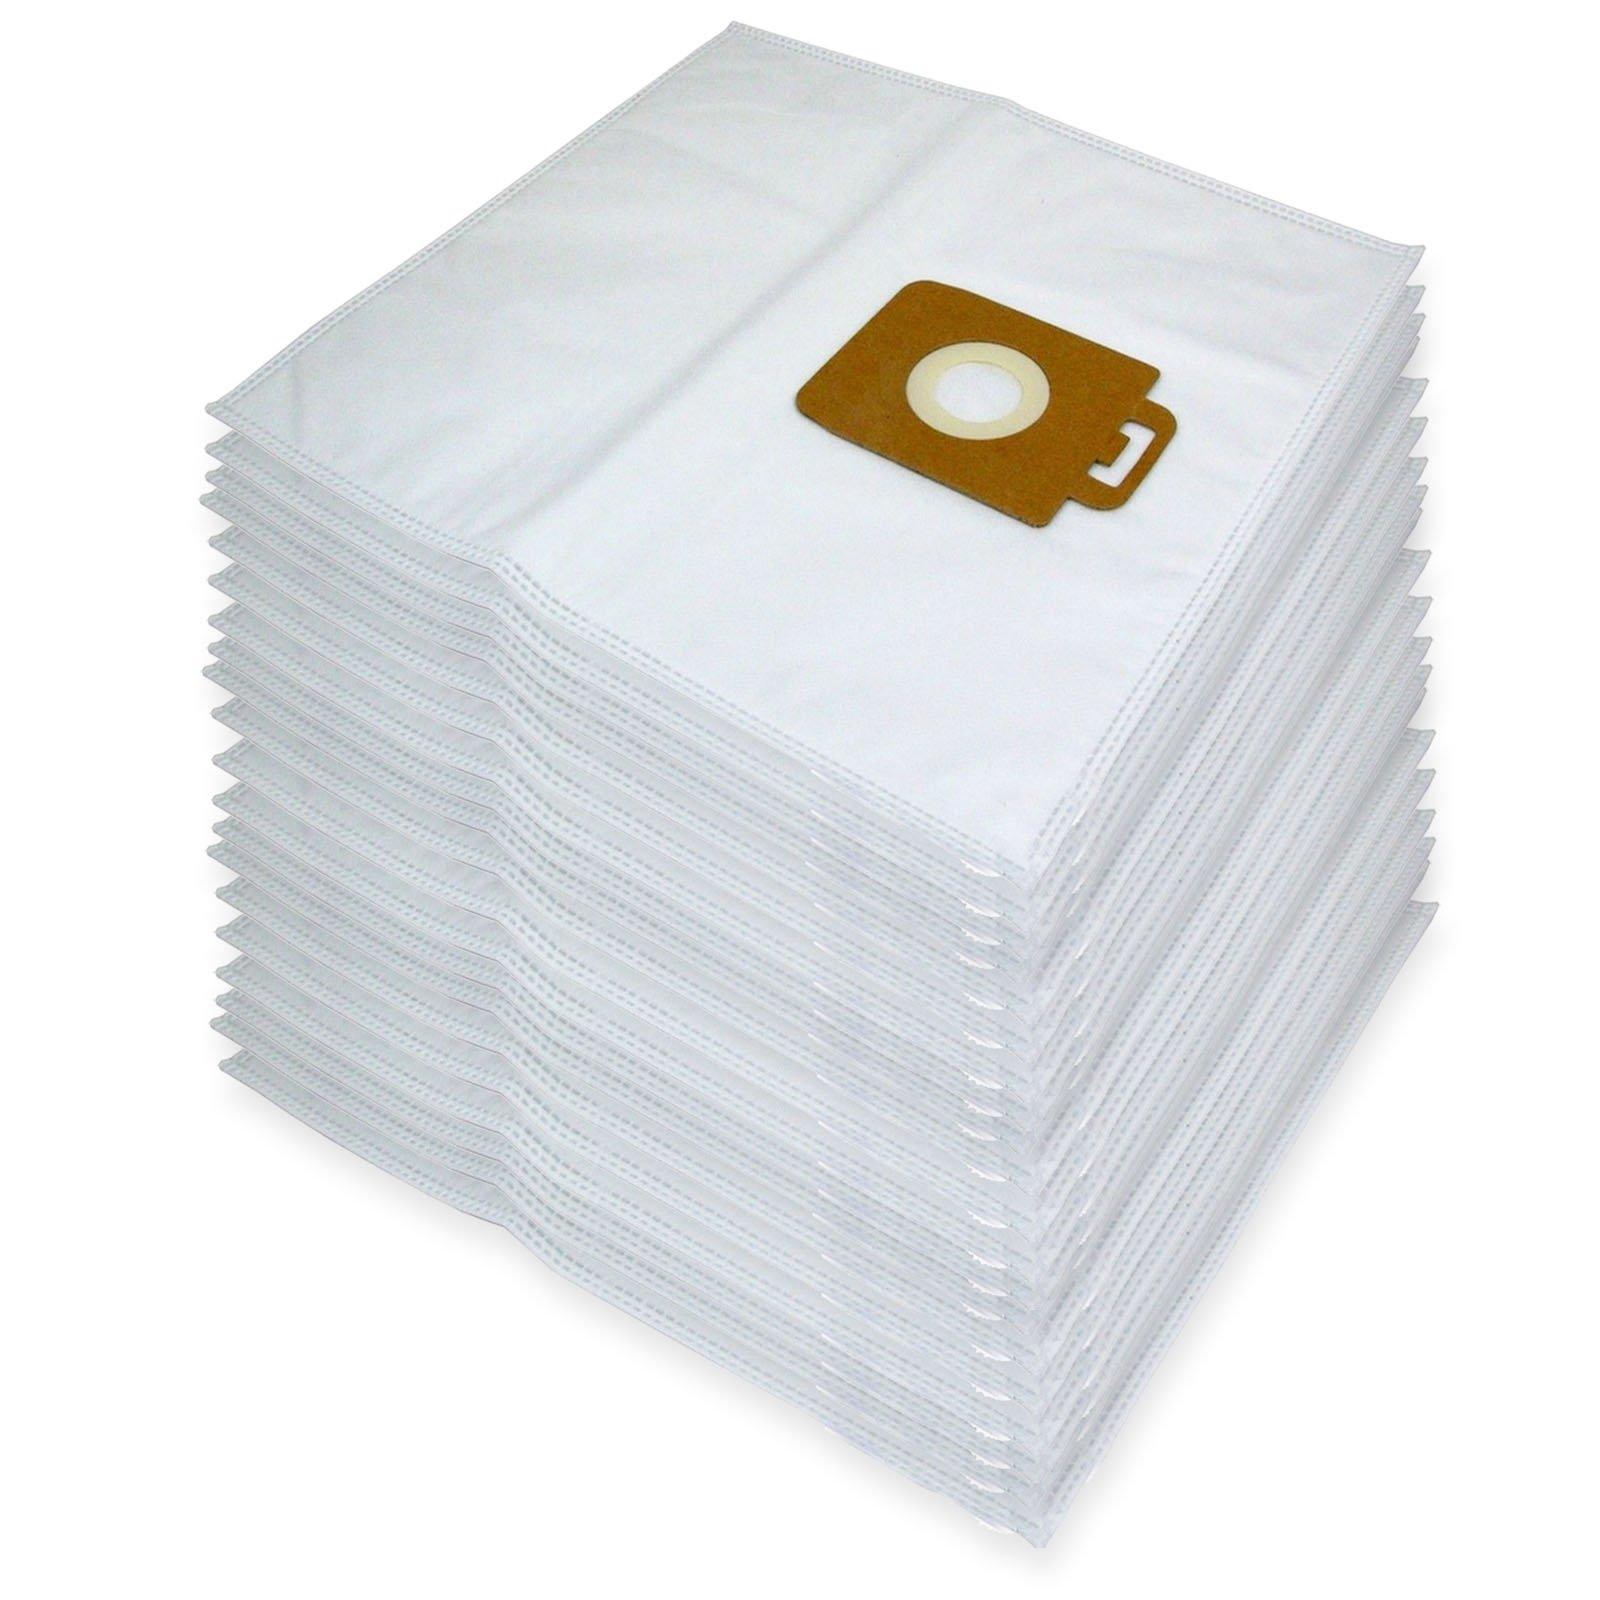 Spares2go - Bolsas de gamuza de microfibra para aspiradoras ...